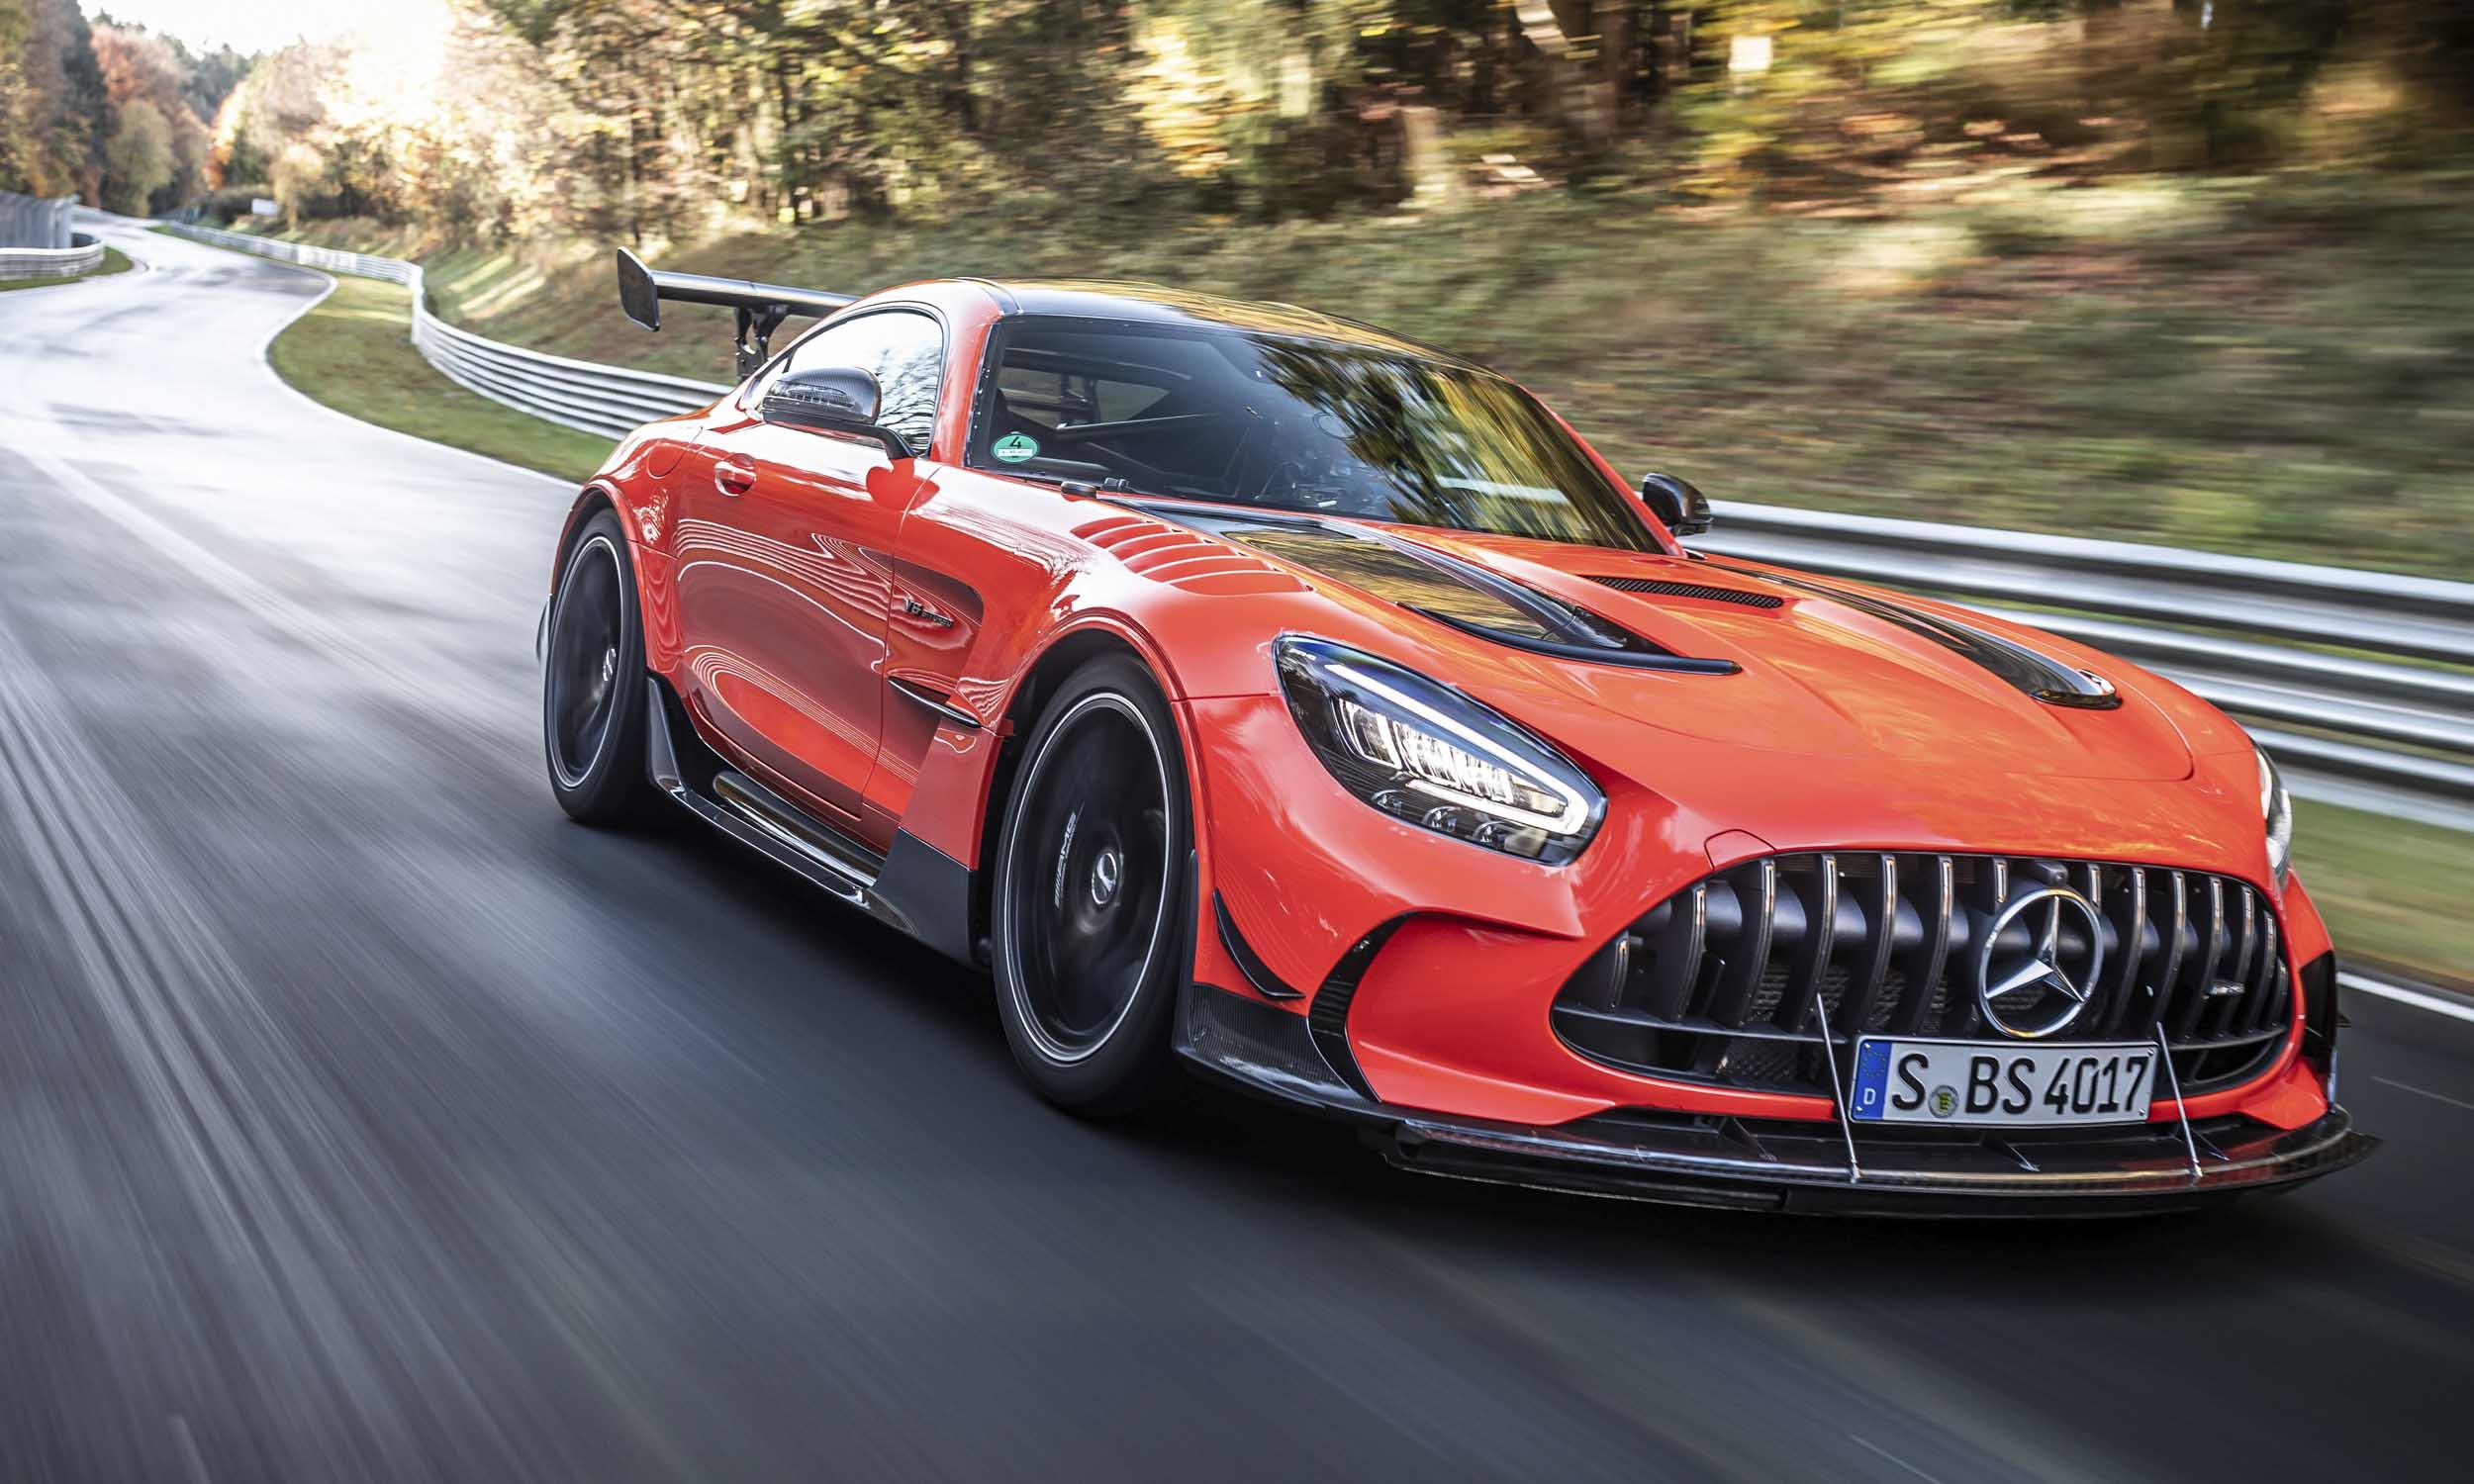 MercedesAMG GT Fastest Production Car at Nurburgringnbsp